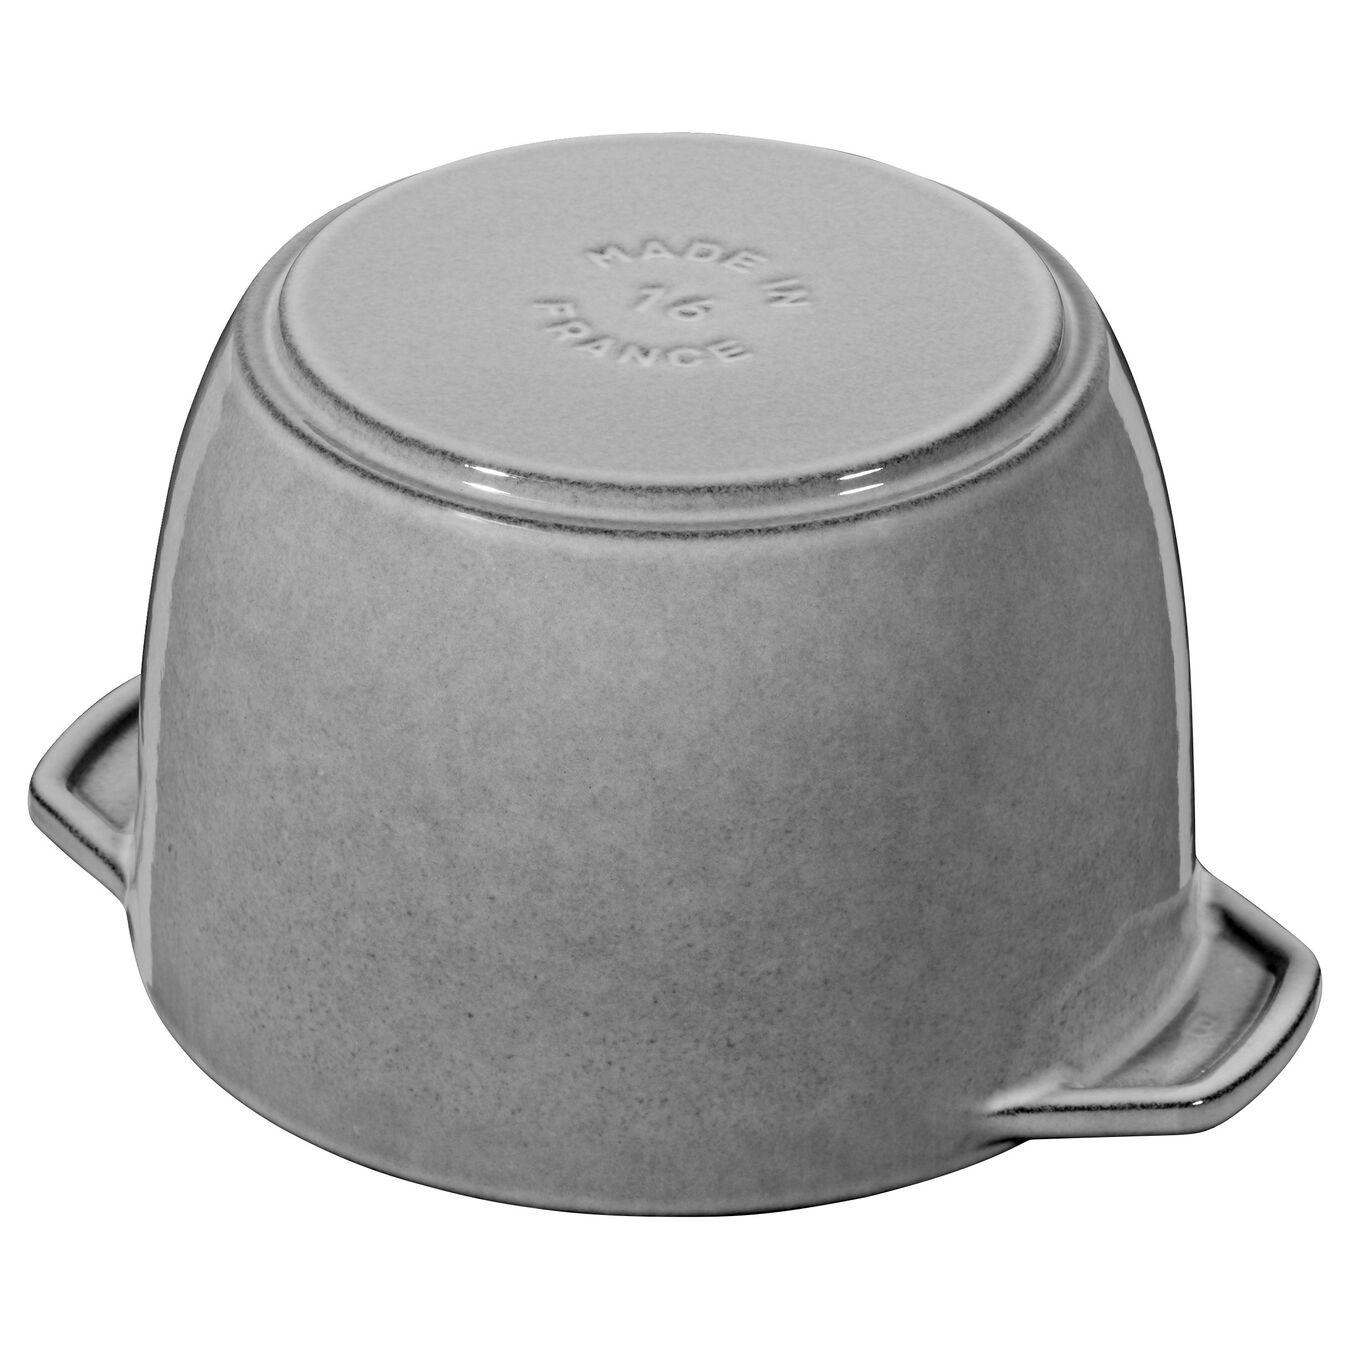 Reis-Cocotte 16 cm, rund, Graphit-Grau, Gusseisen,,large 6